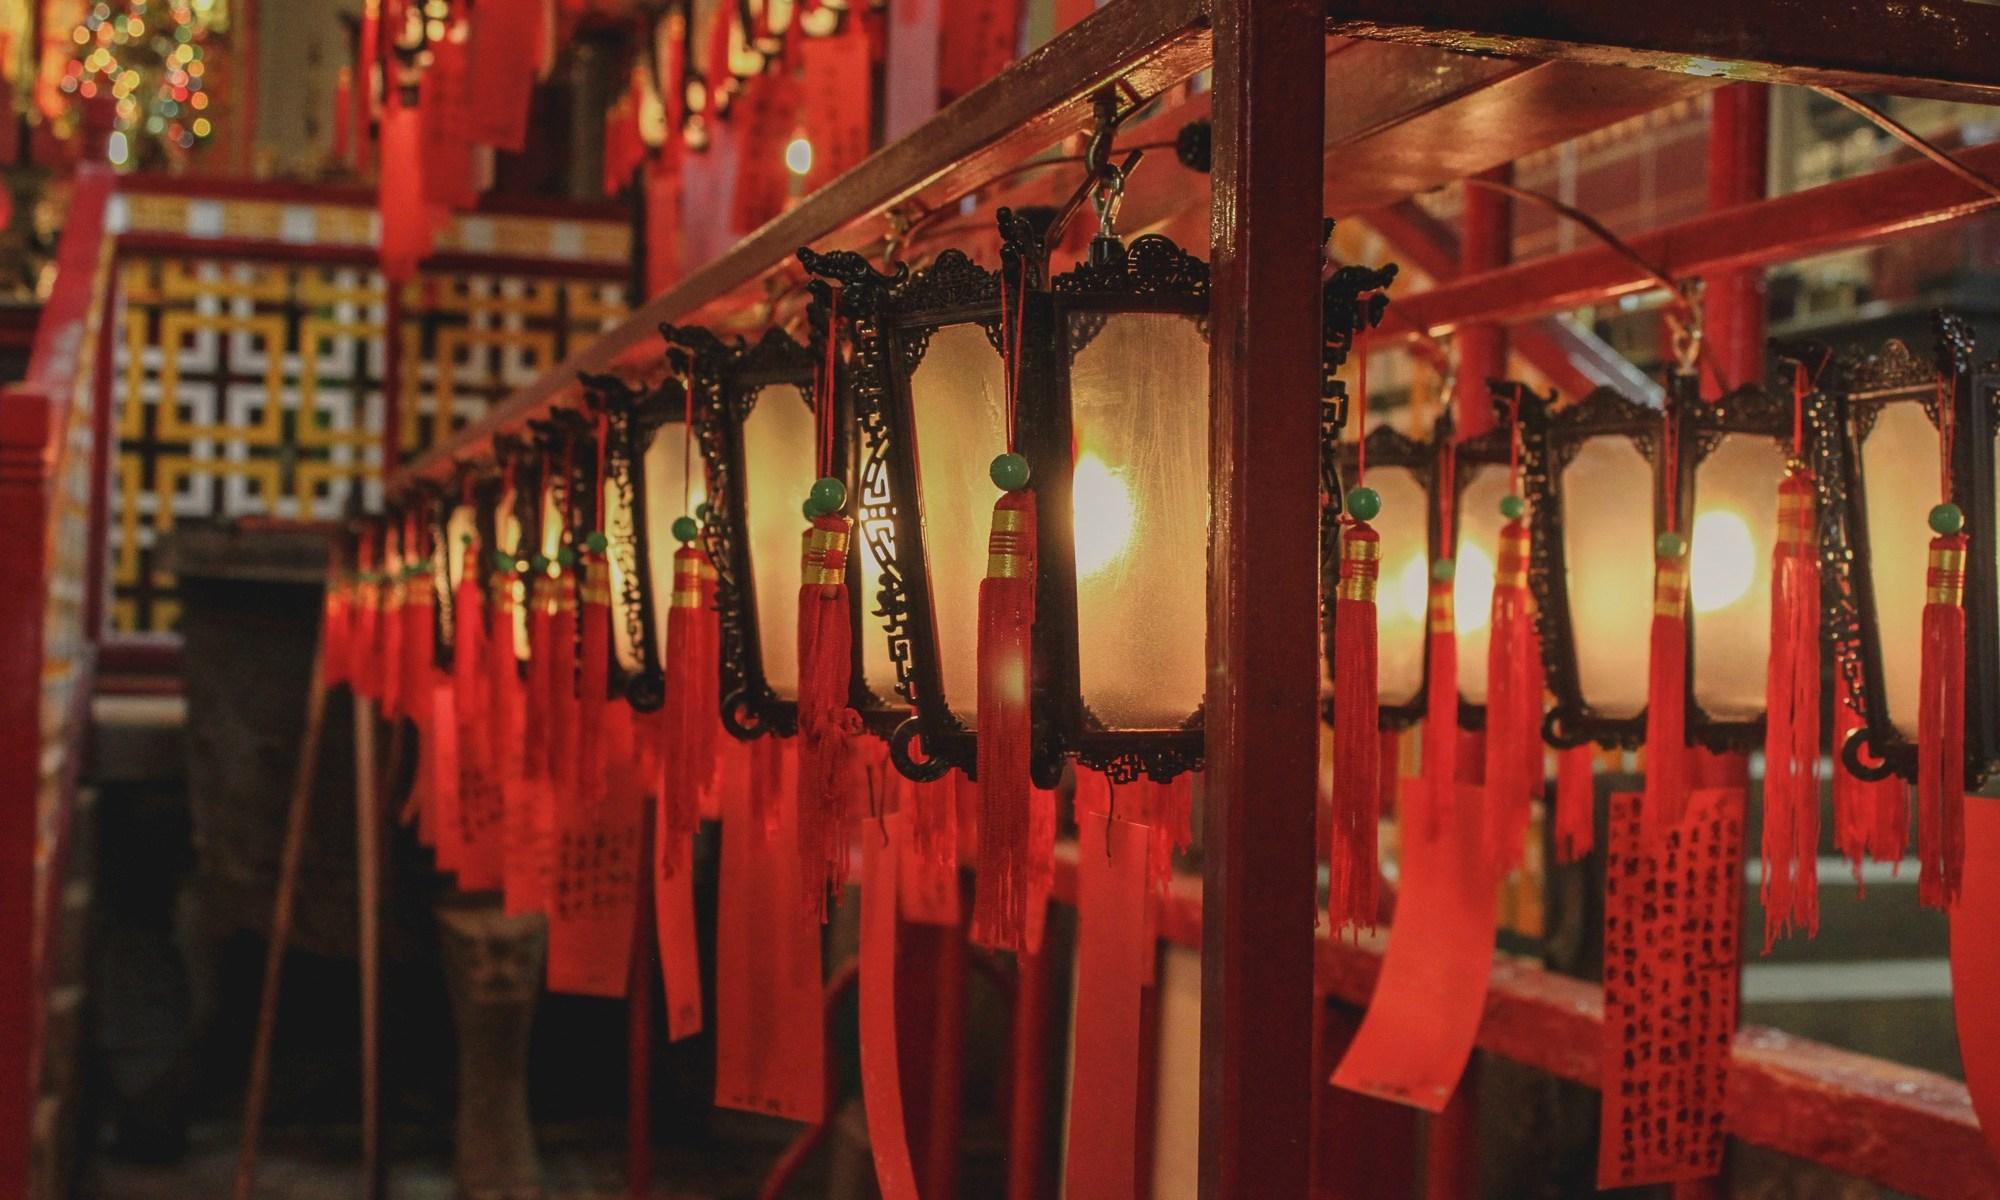 Lanterns in Man Mo Temple Hong Kong